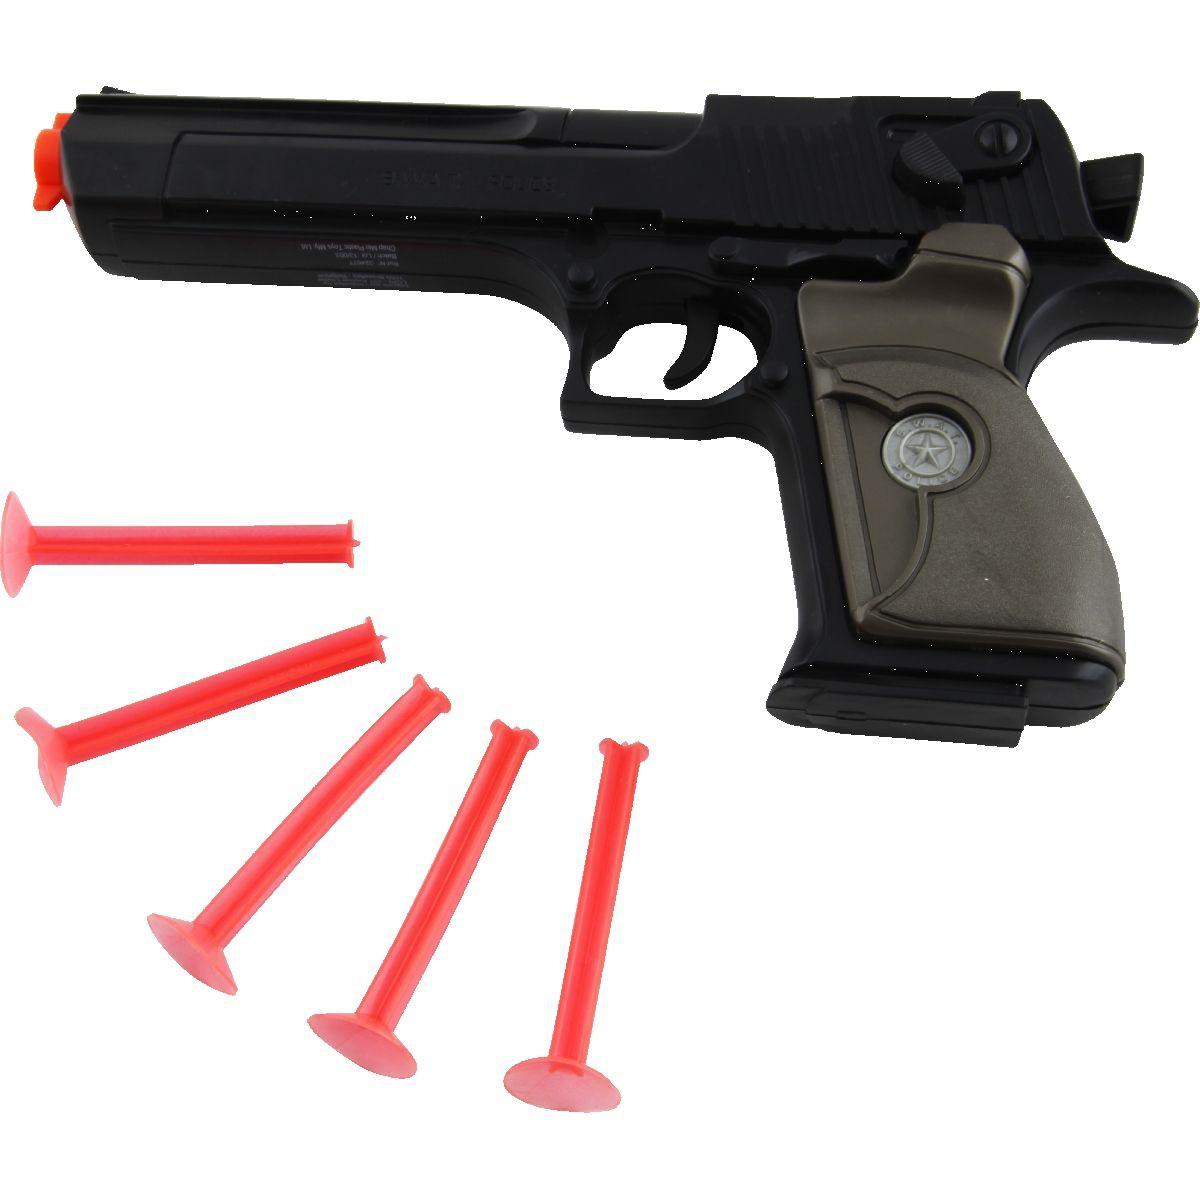 pistolet a flechette